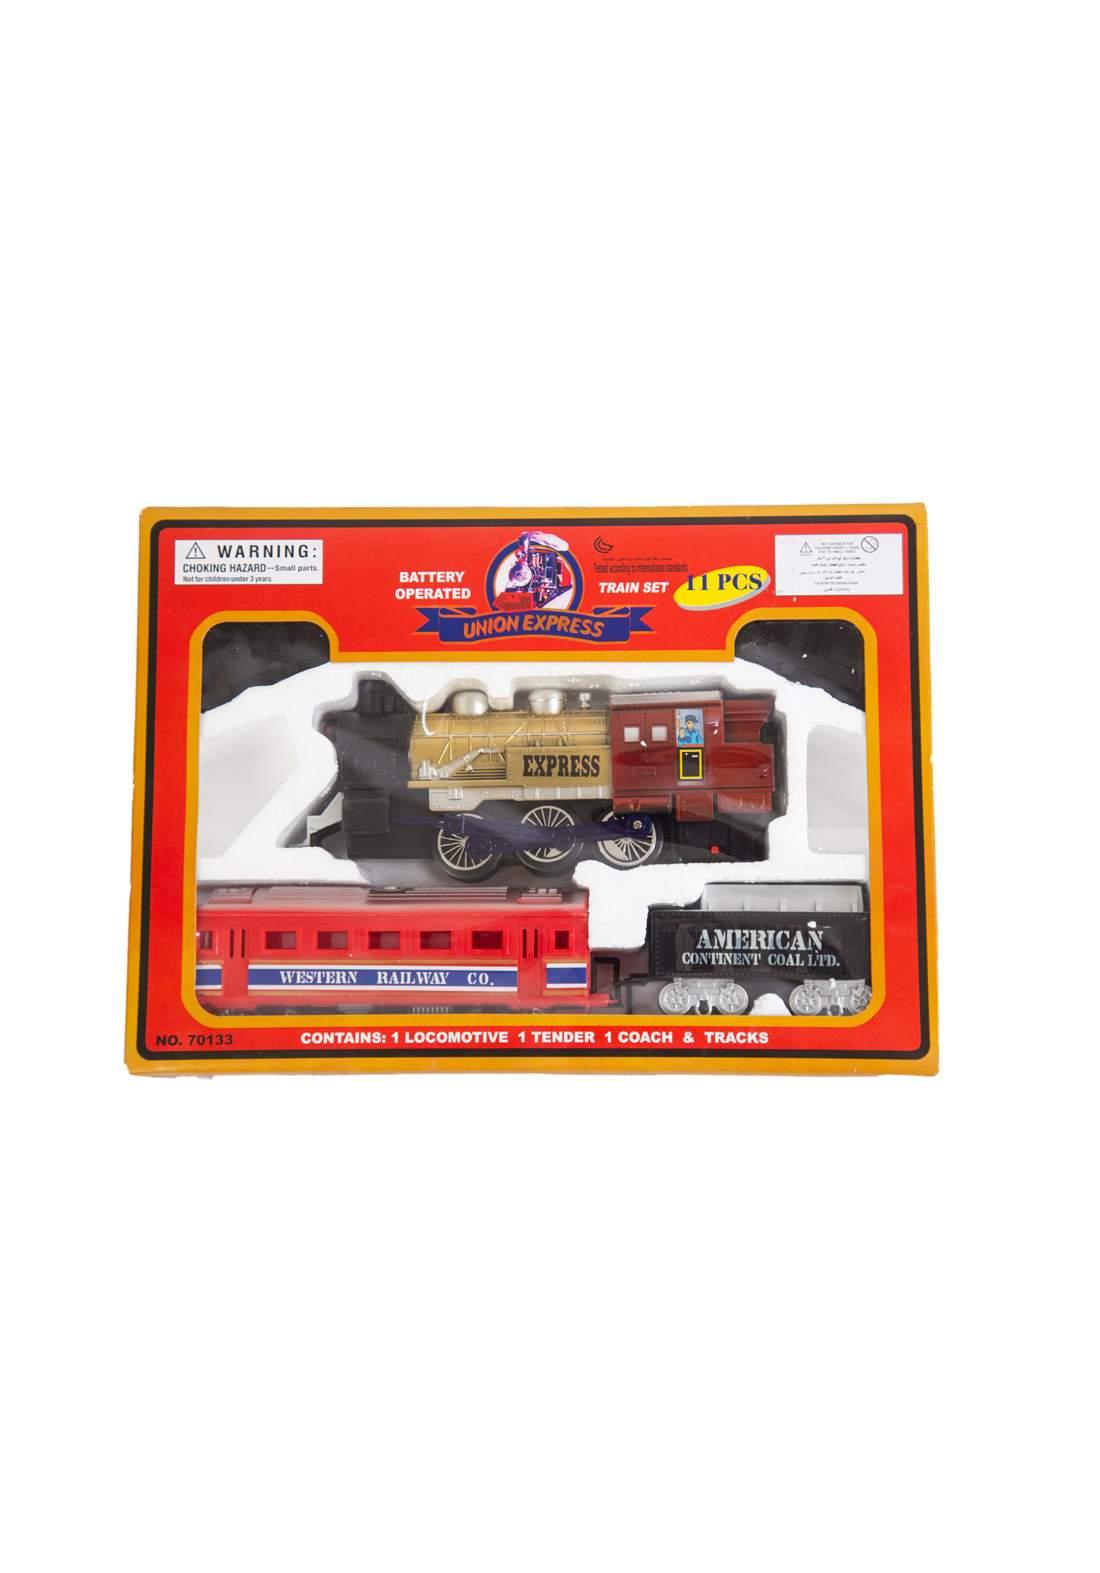 Train Game For Kids لعبة القطار للأطفال